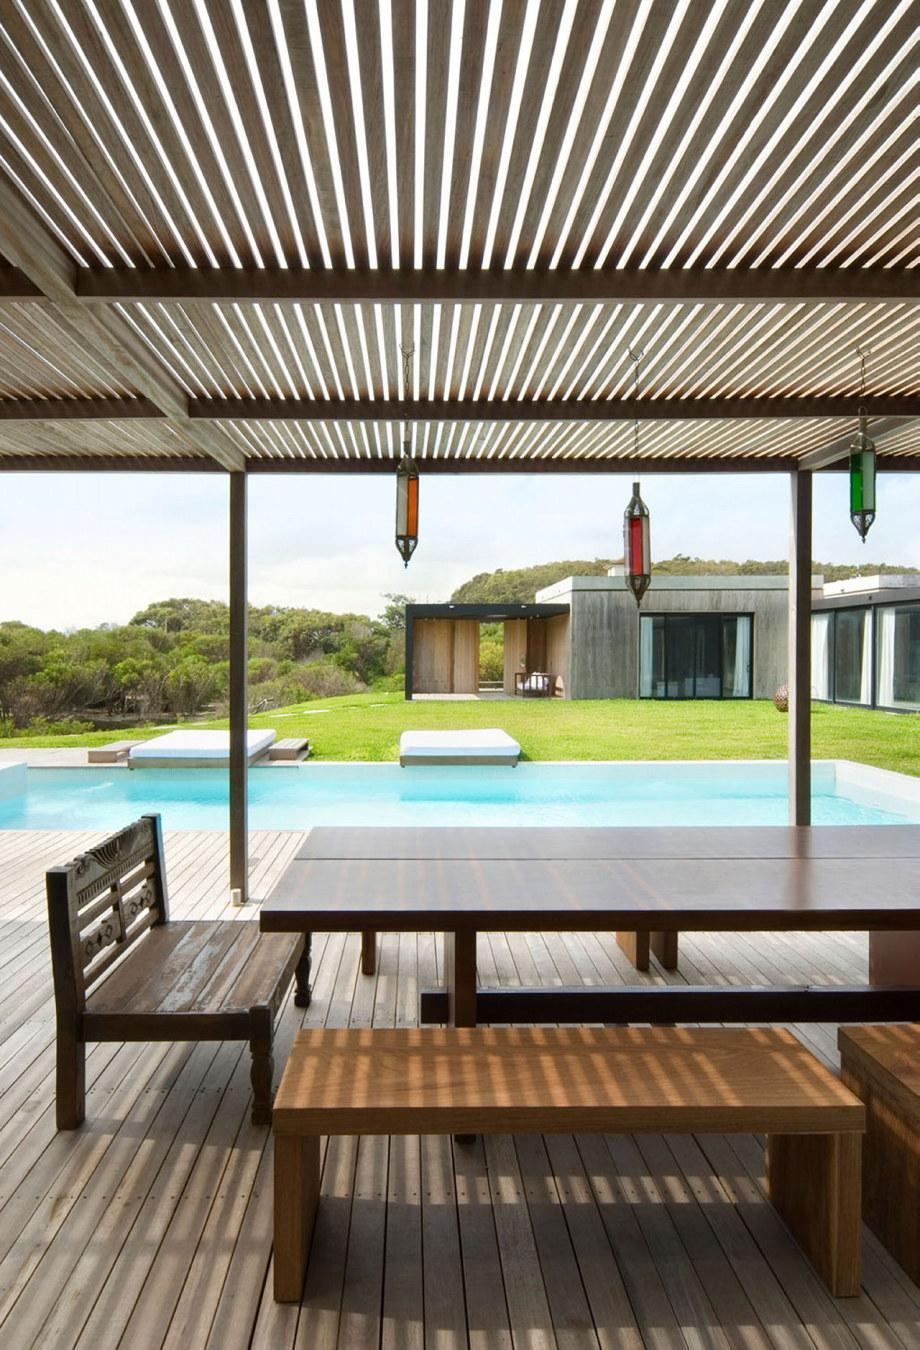 The beach house La Boyita Residence by Martin Gomez Arguitectos, Uruguay 14